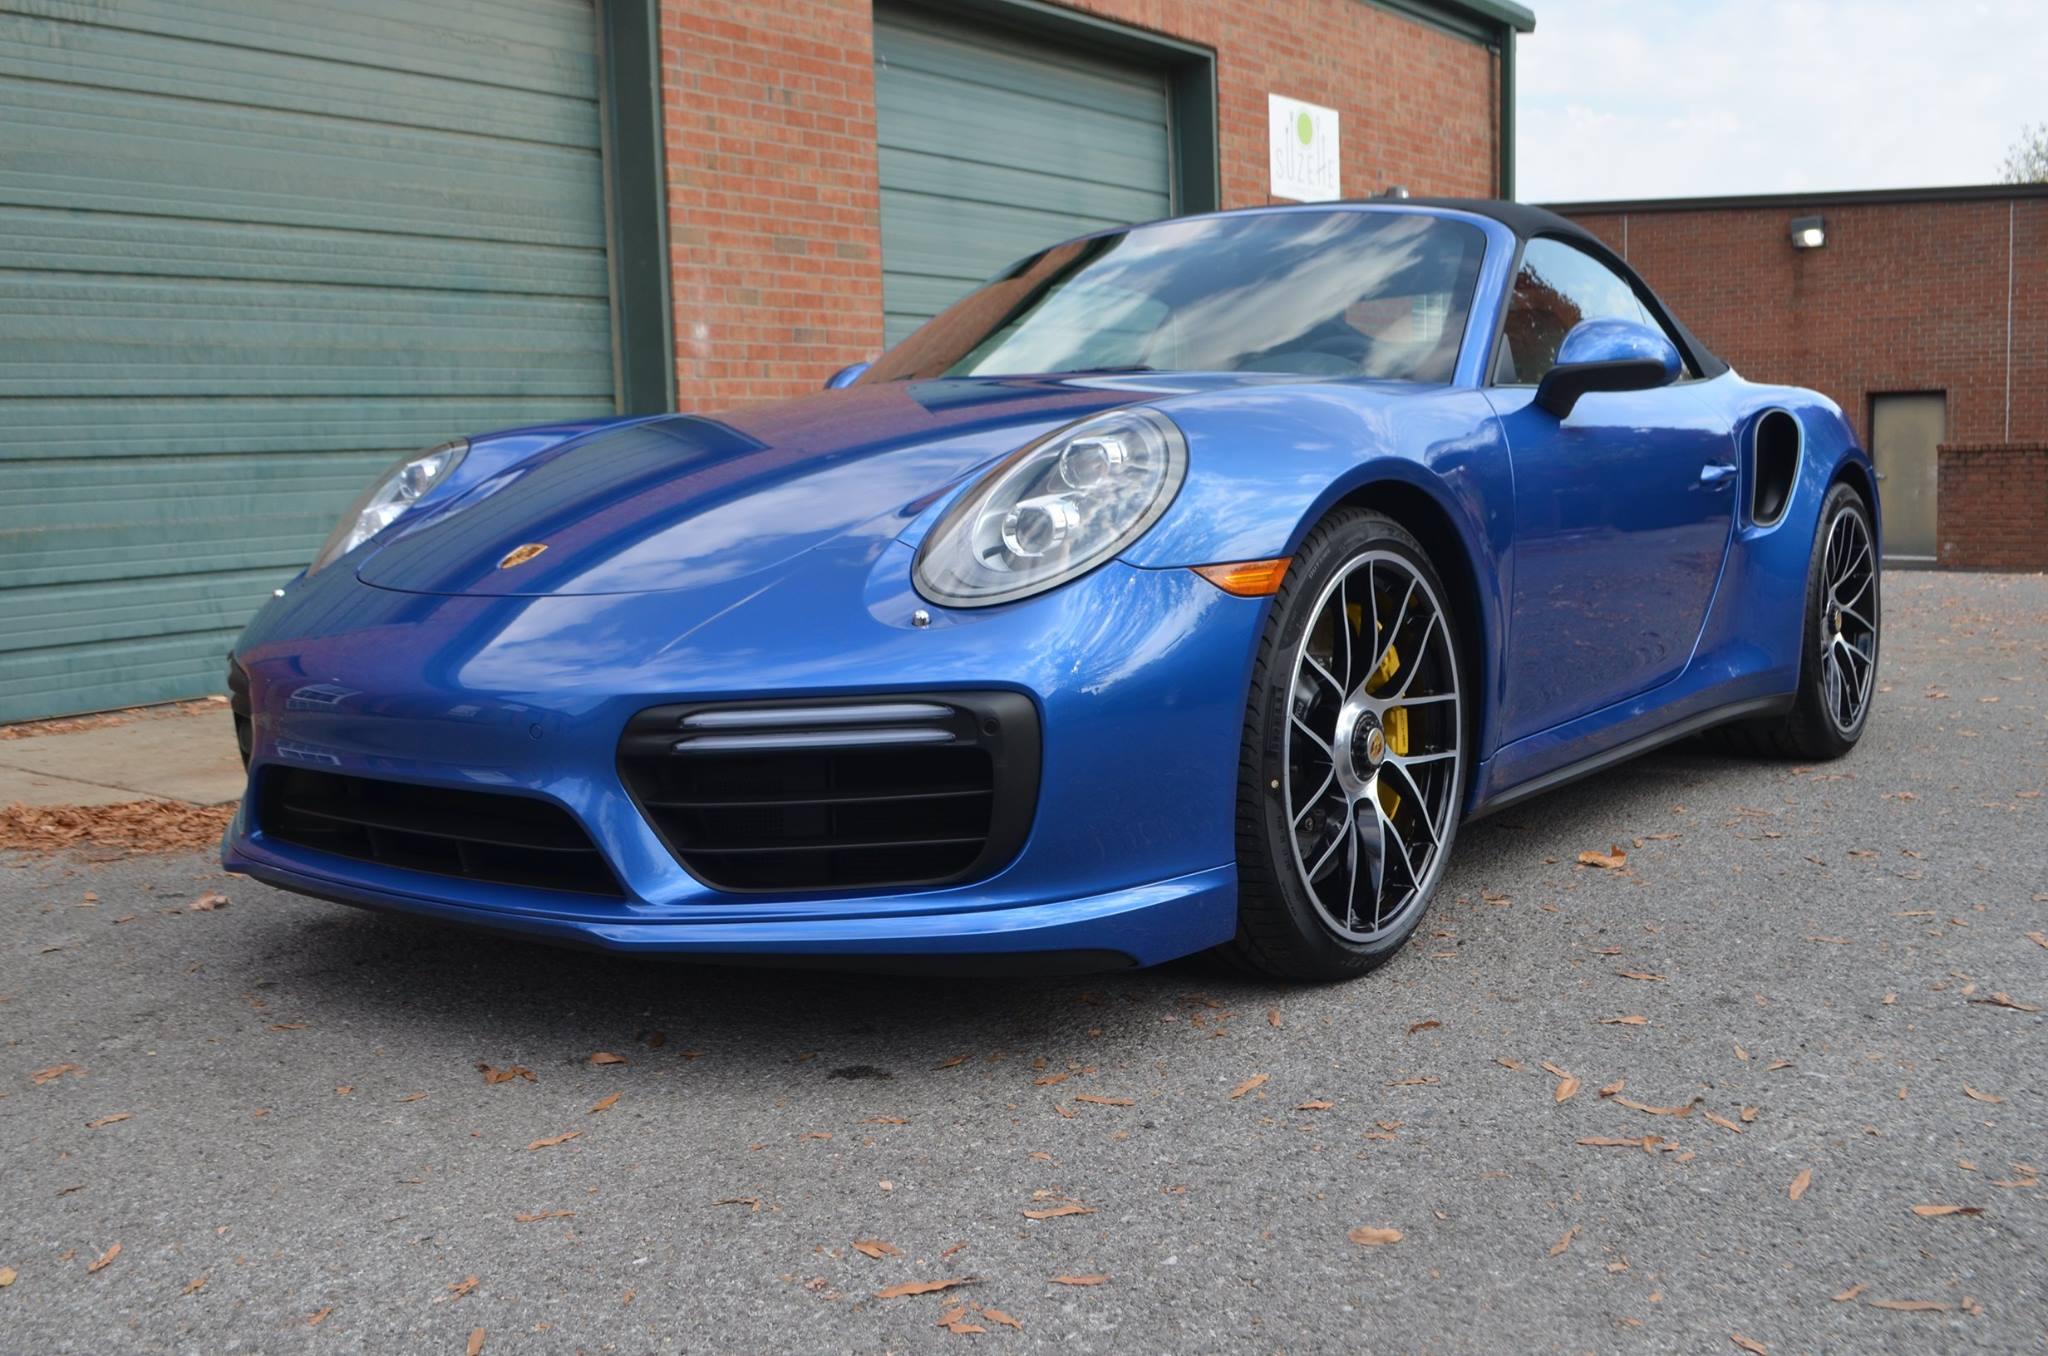 Porsche 991.2: Track Pack PPF, CQ FINEST Reserve